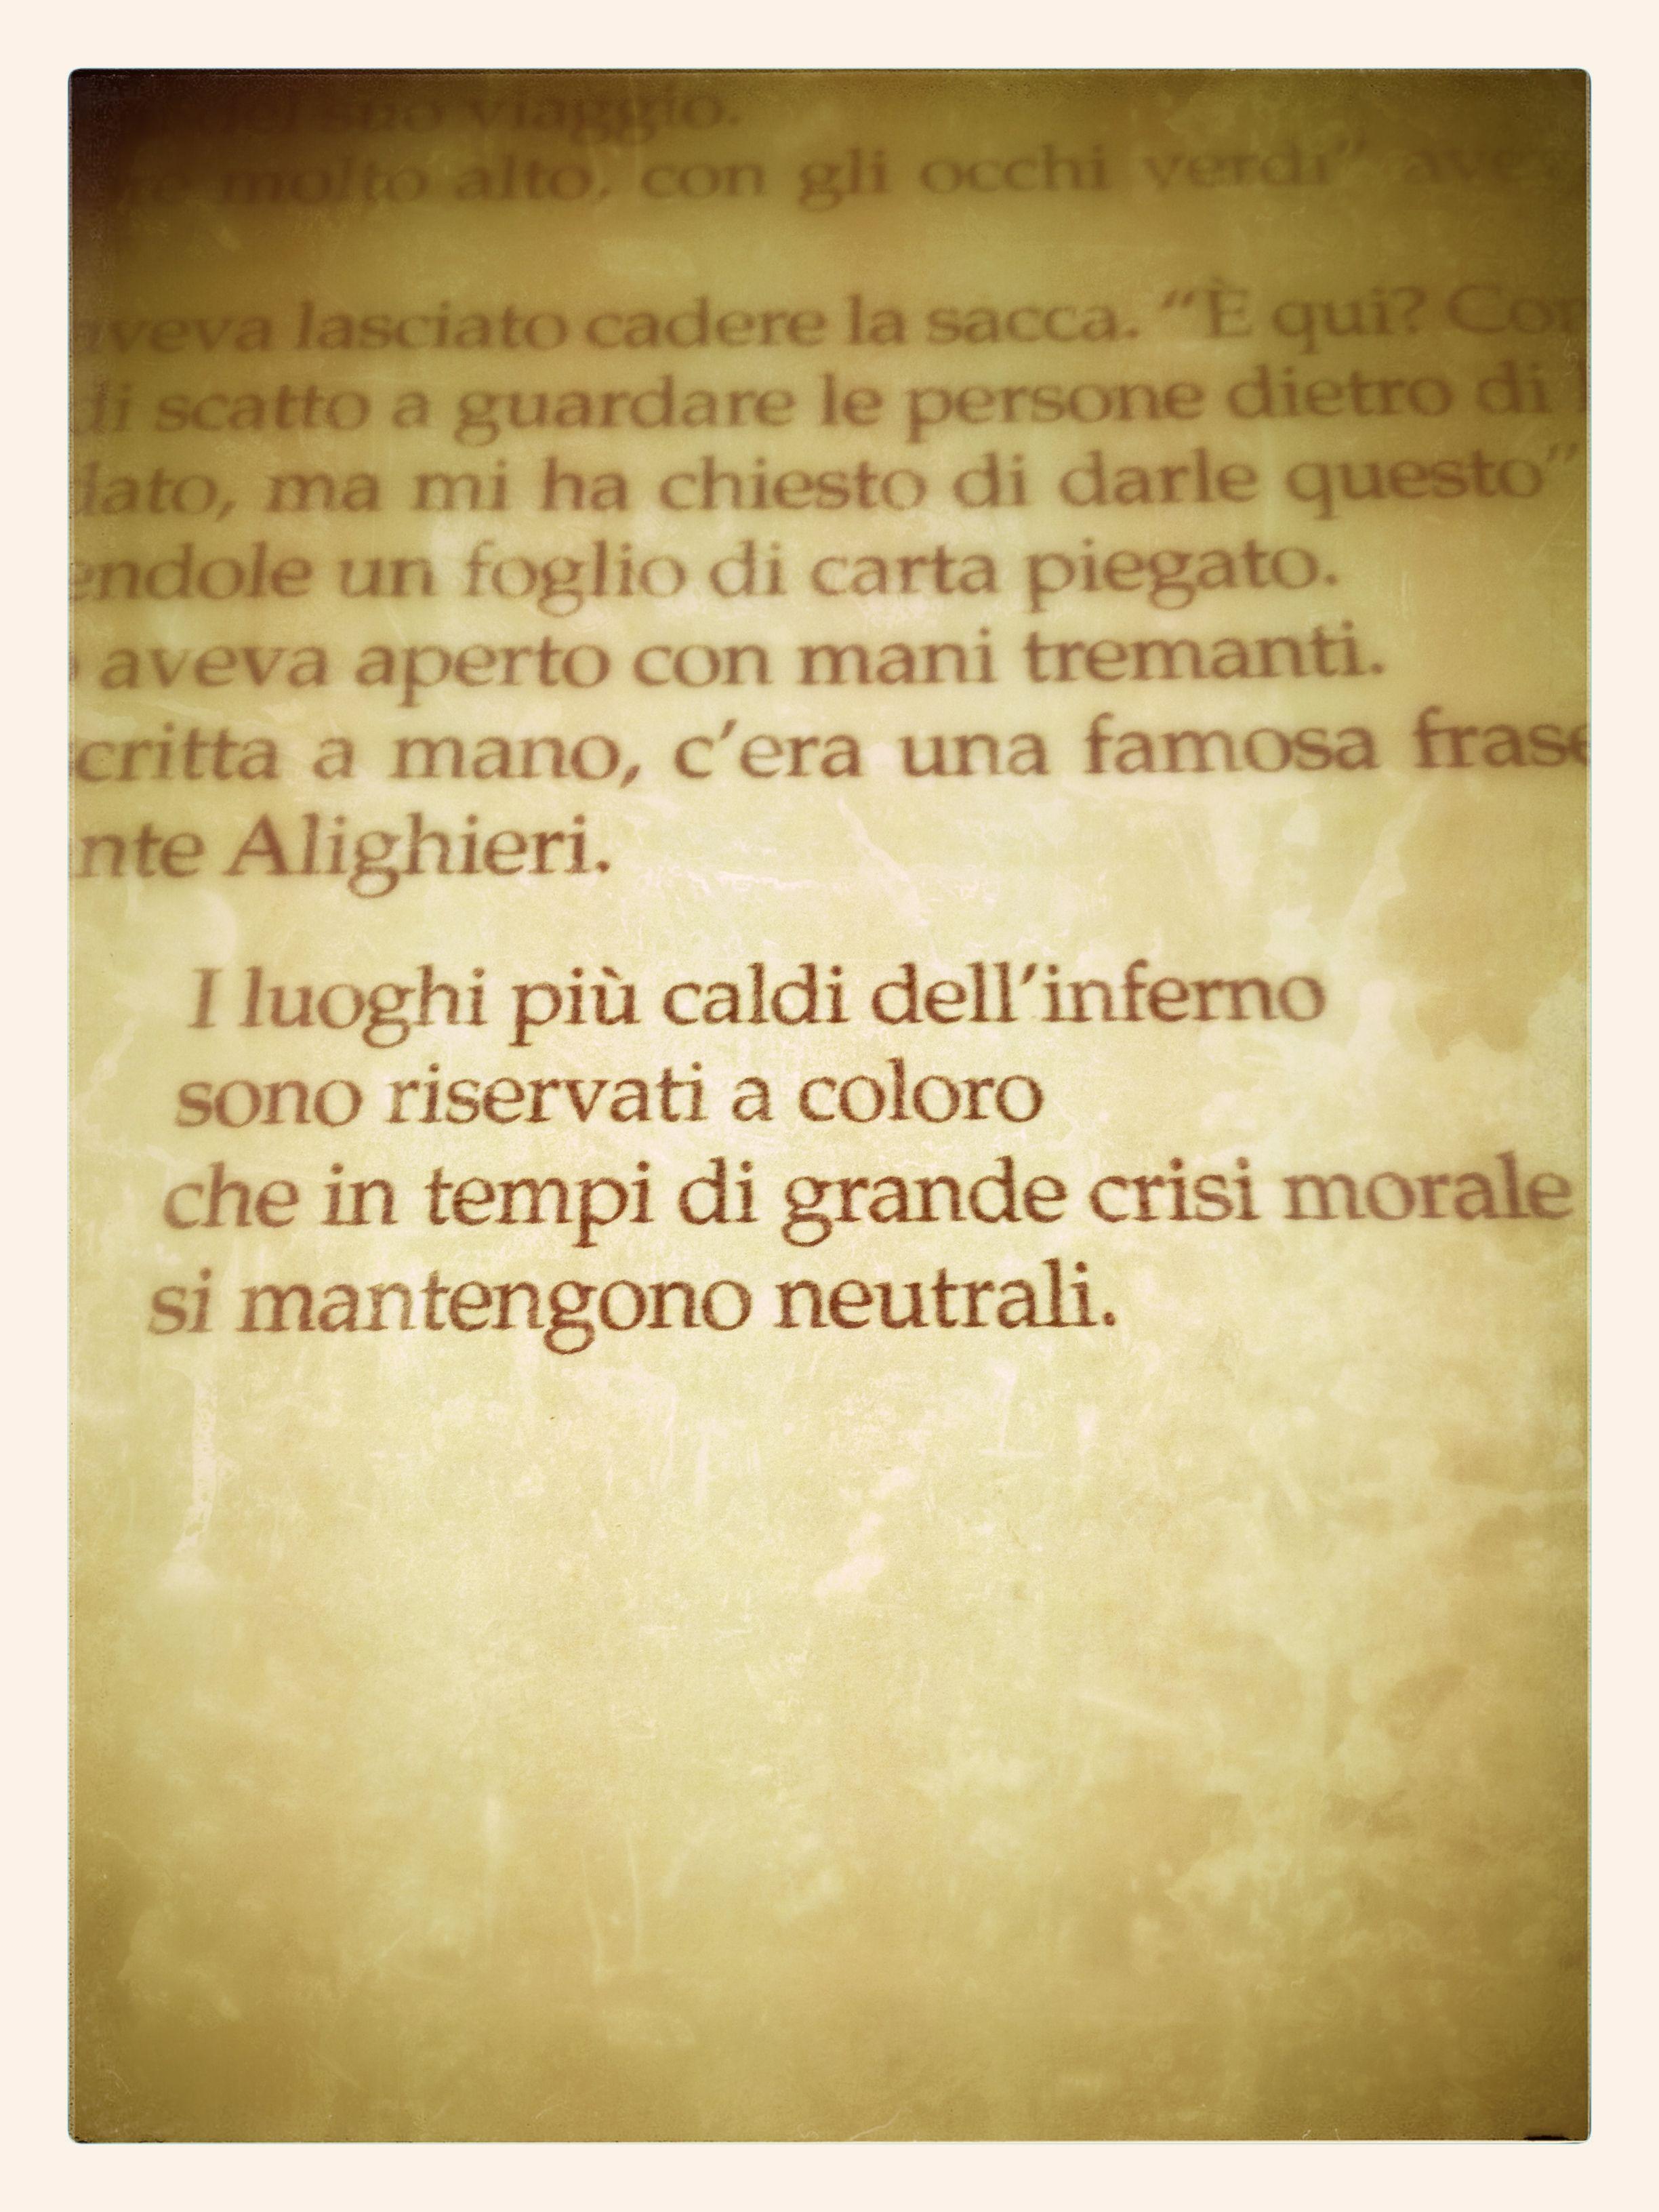 Frasi Matrimonio Dante.Dante Alighieri Citazioni Citazioni Da Libri Dante Alighieri